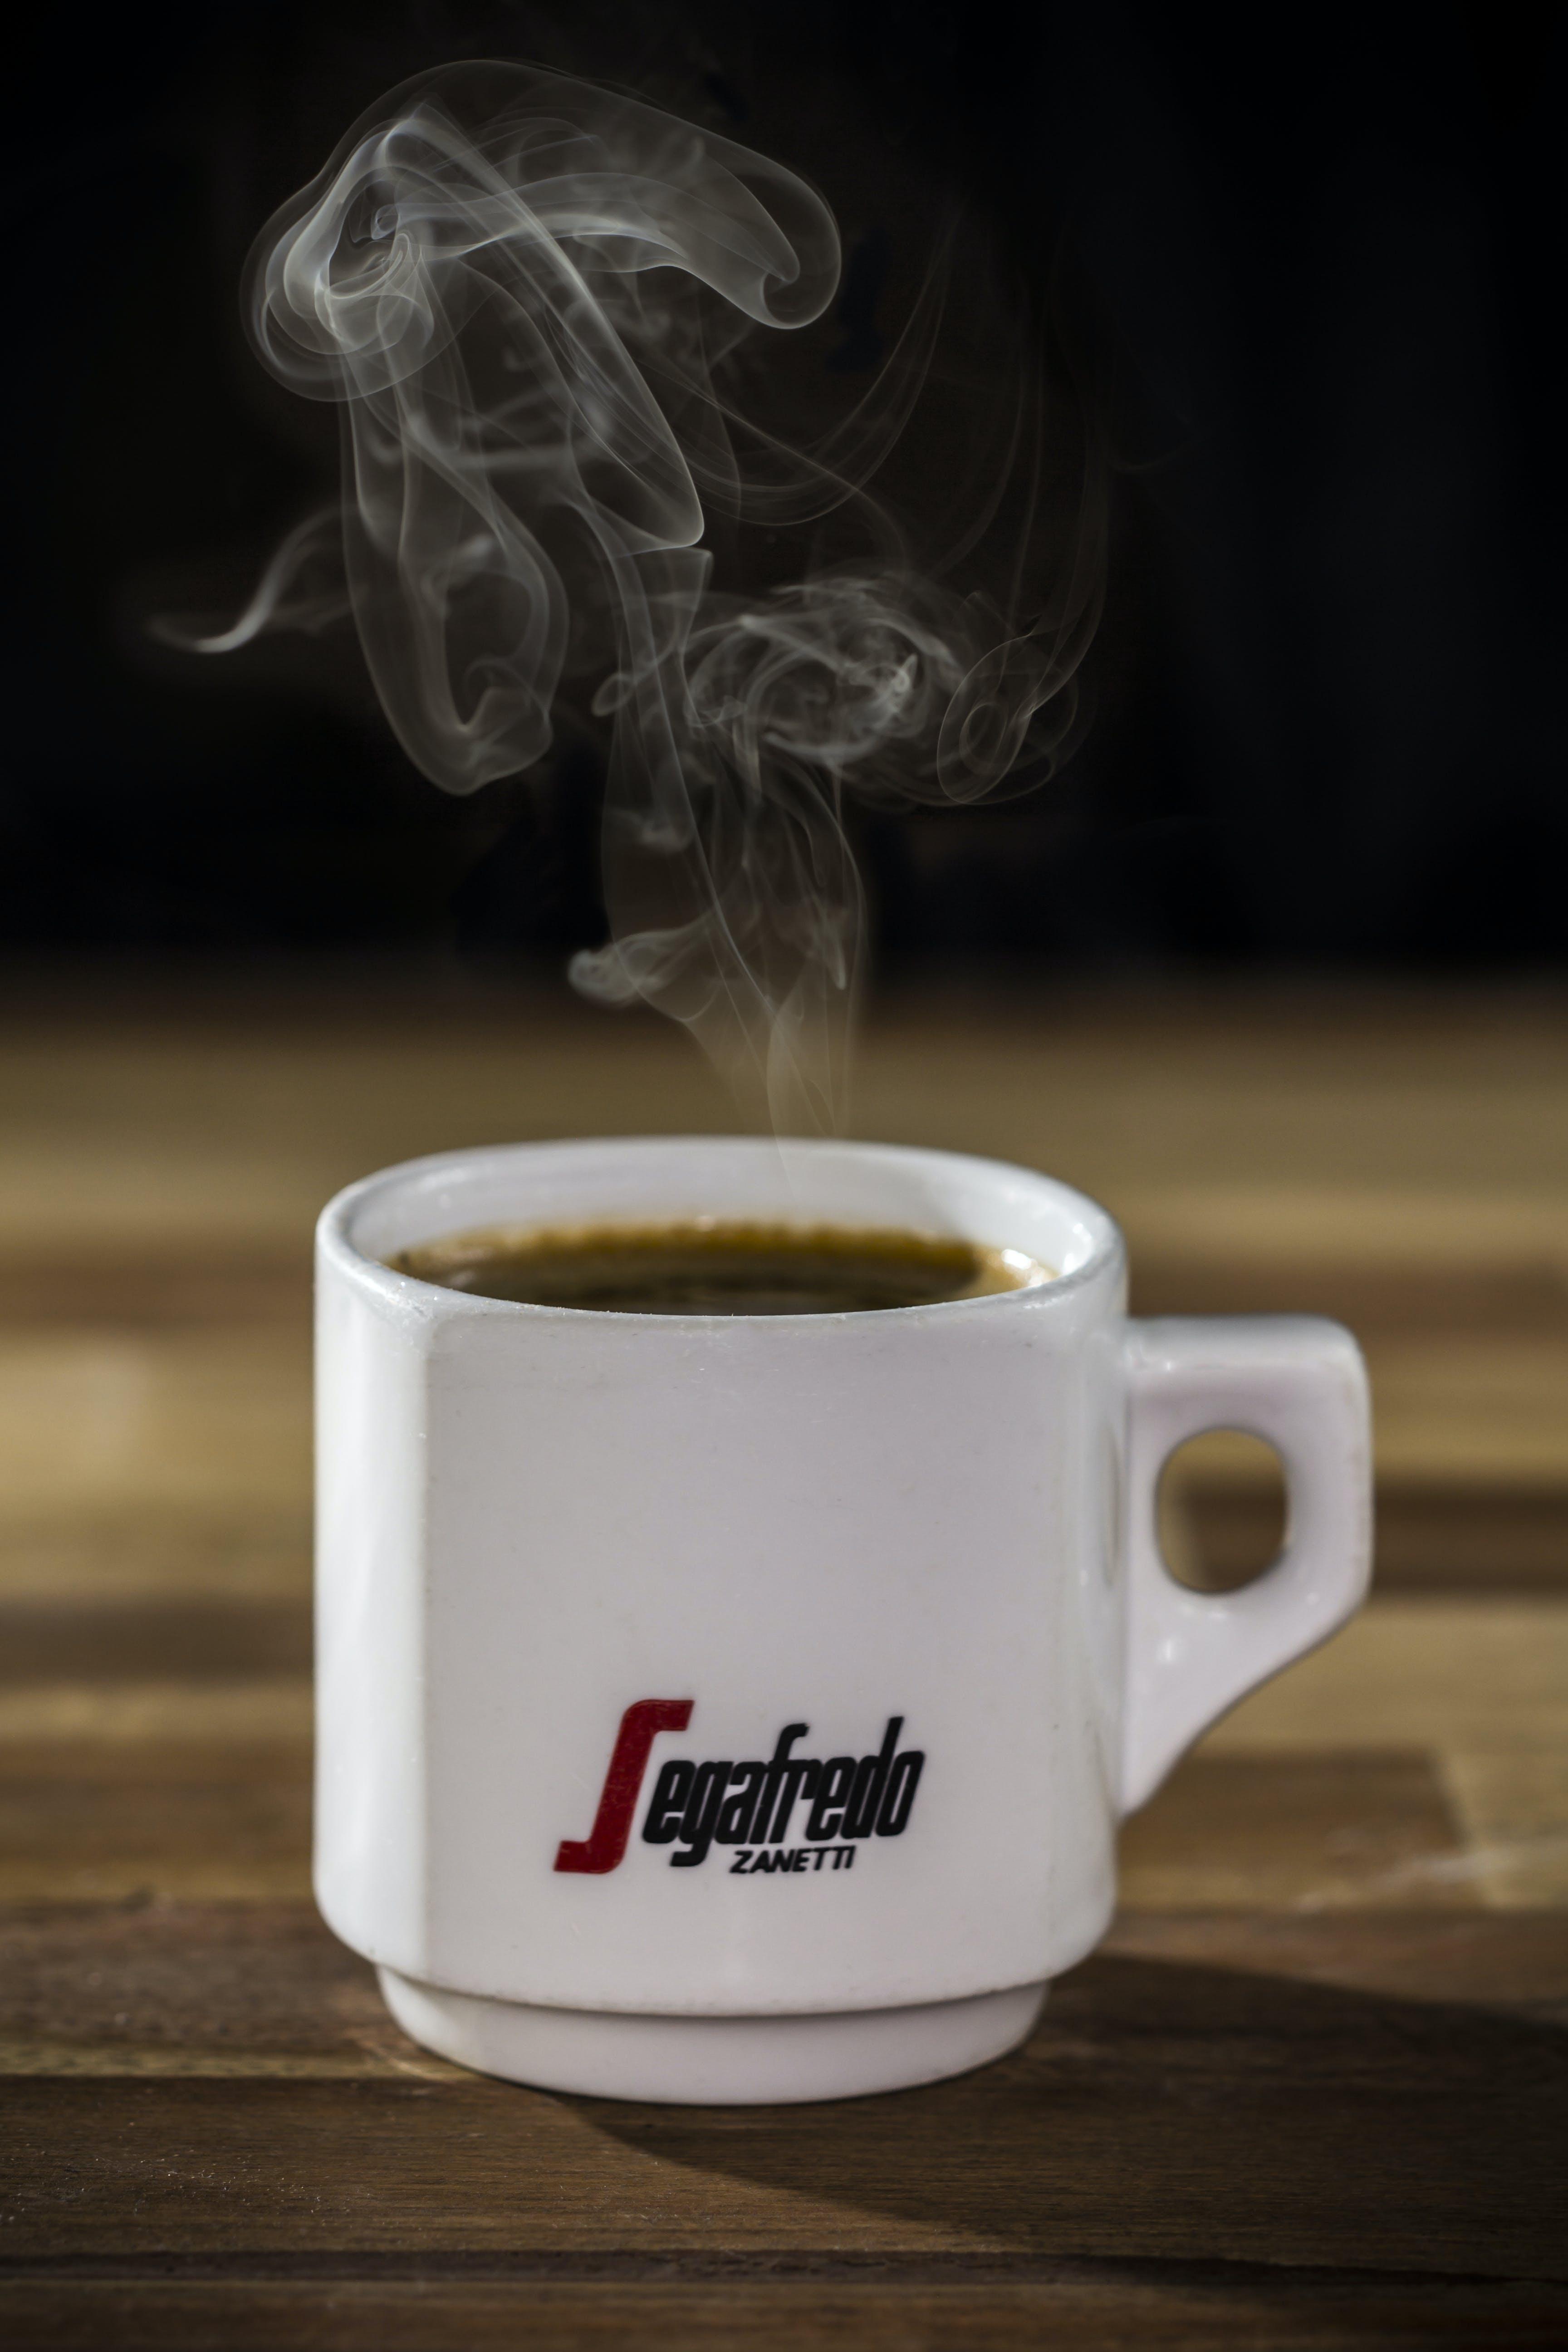 Fotos de stock gratuitas de atractivo, beber, café, cafeína